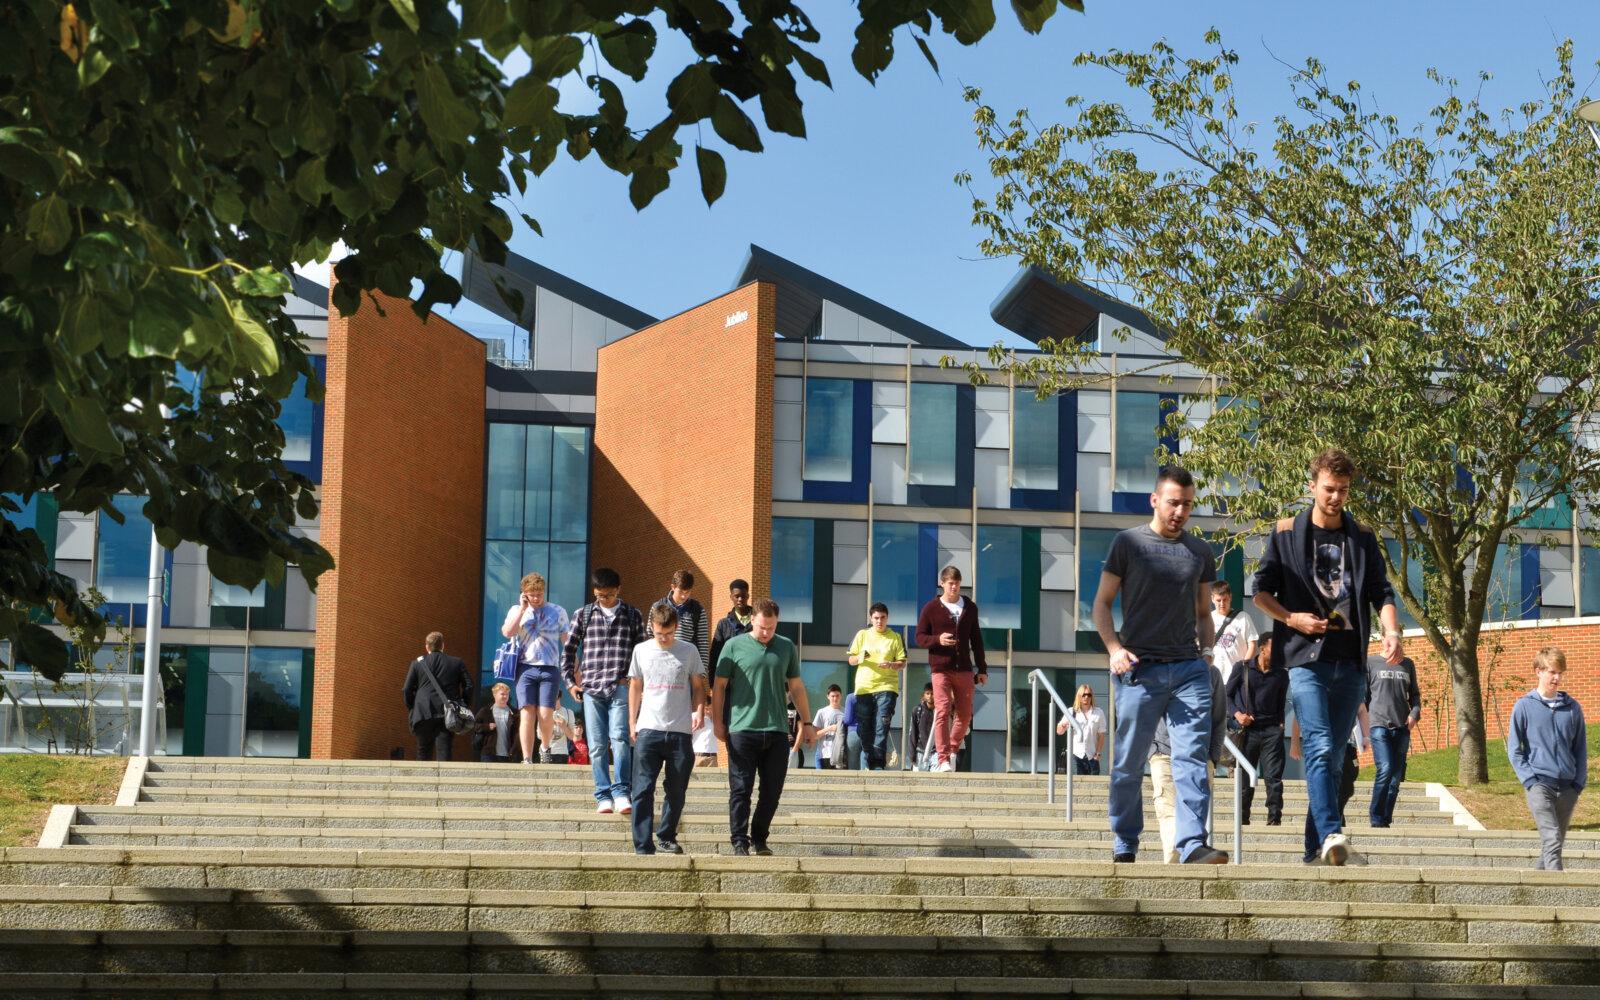 University of Sussex Jubilee Building entrance